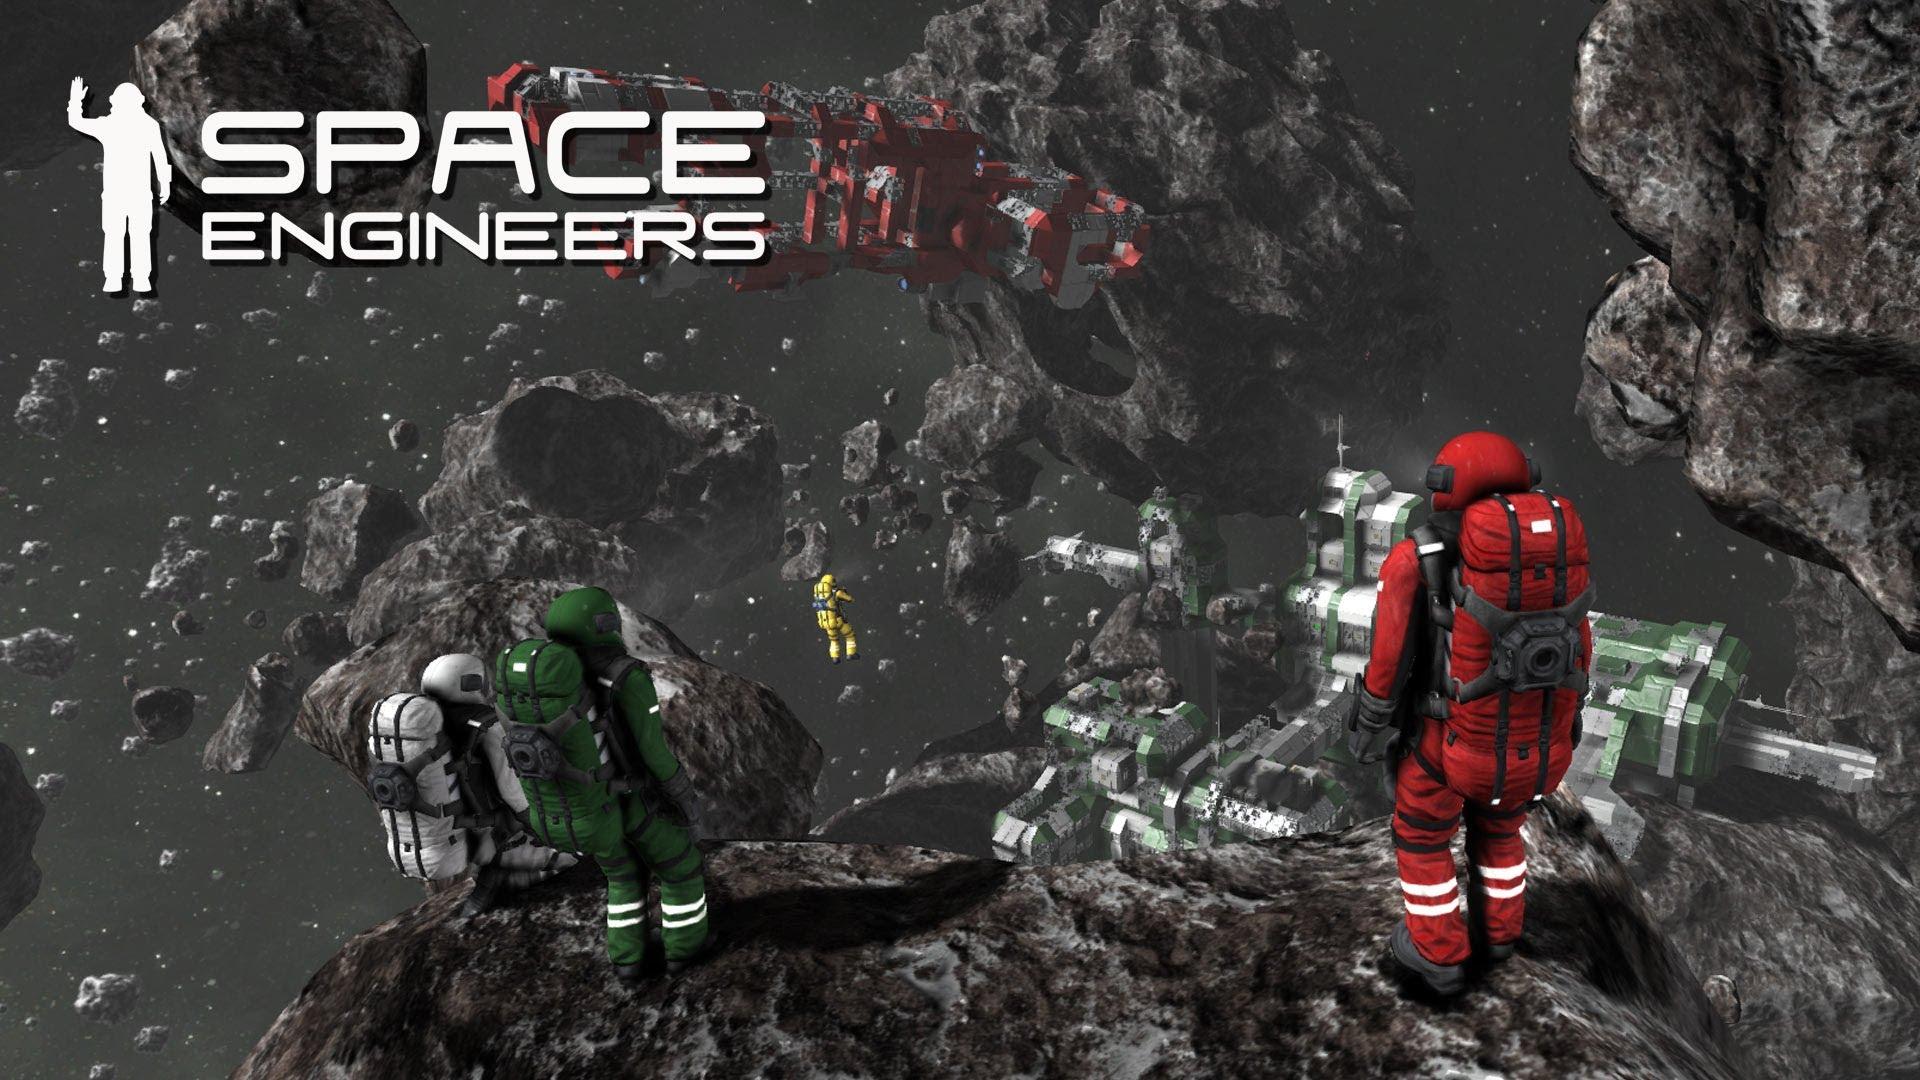 Space Engineers telecharger gratuit de PC et Torrent